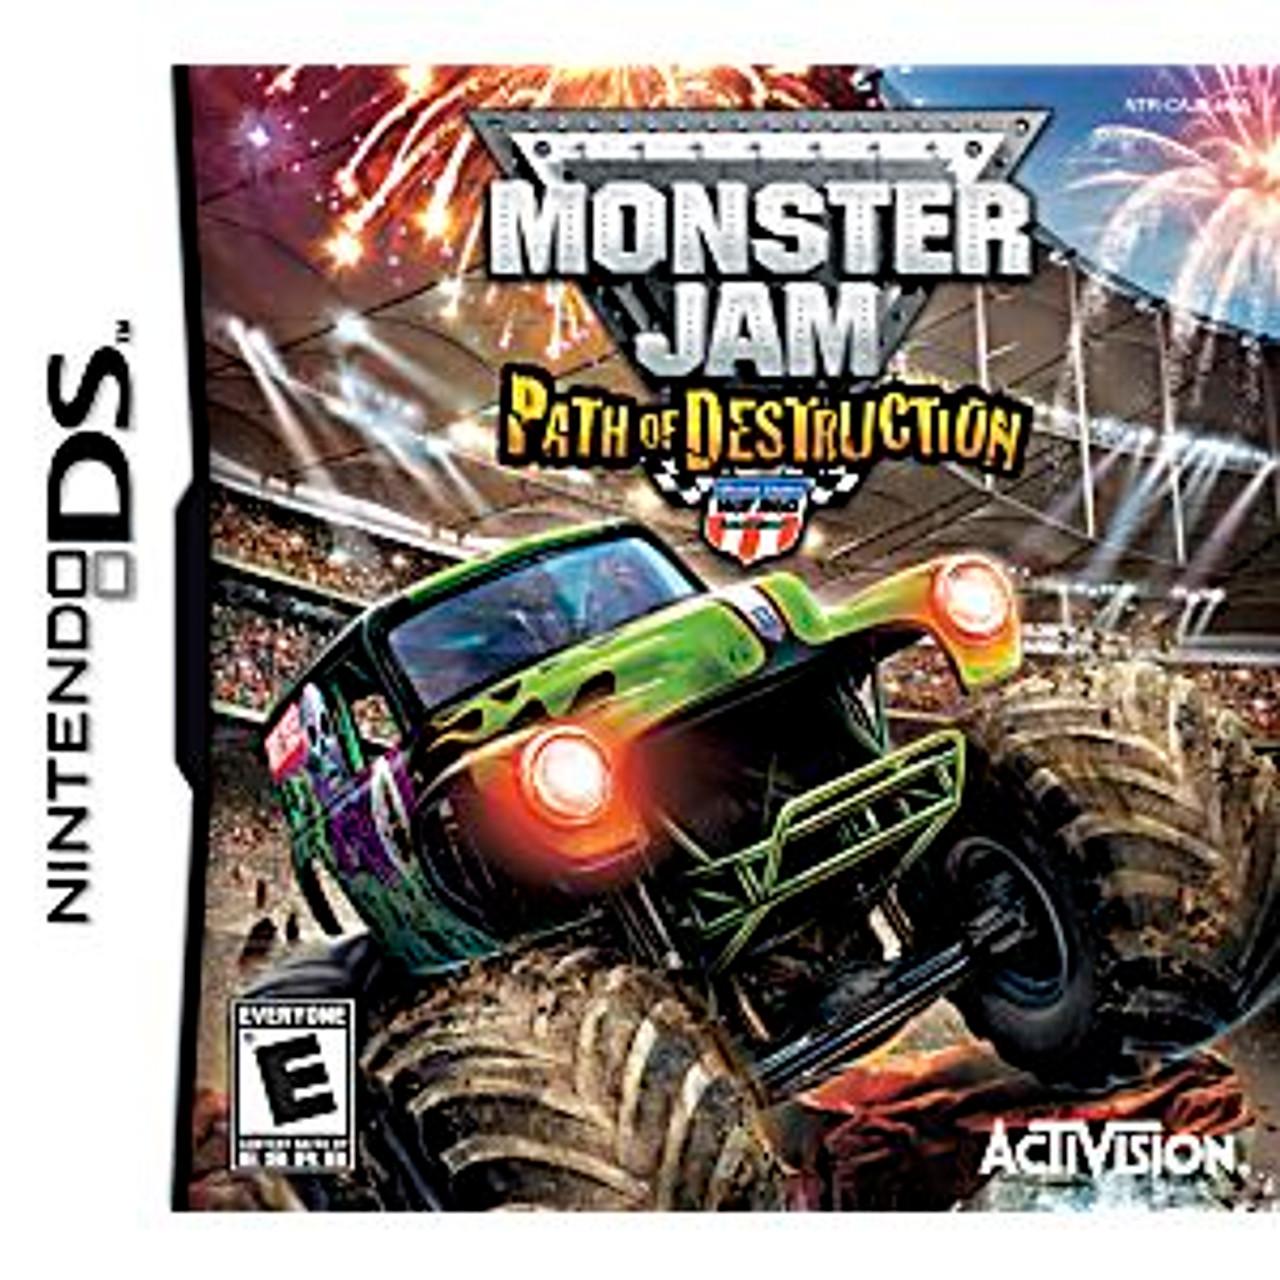 MONSTER JAM: PATH OF DESTRUCTION - NDS